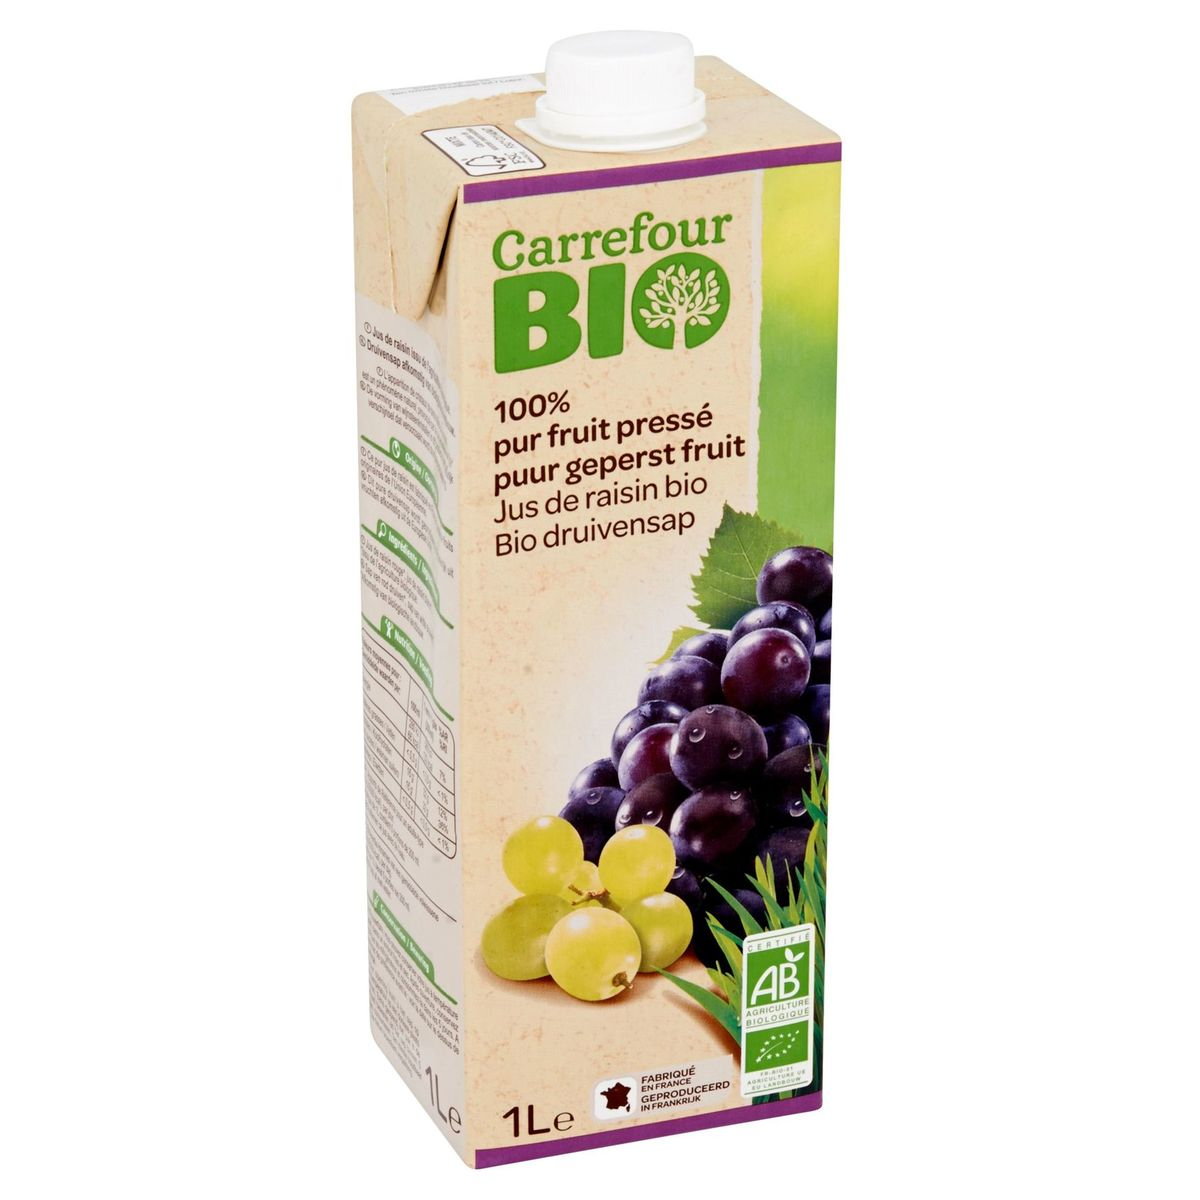 Carrefour Bio 100% Pur Fruit Pressé Jus de Raisin Bio 1 L